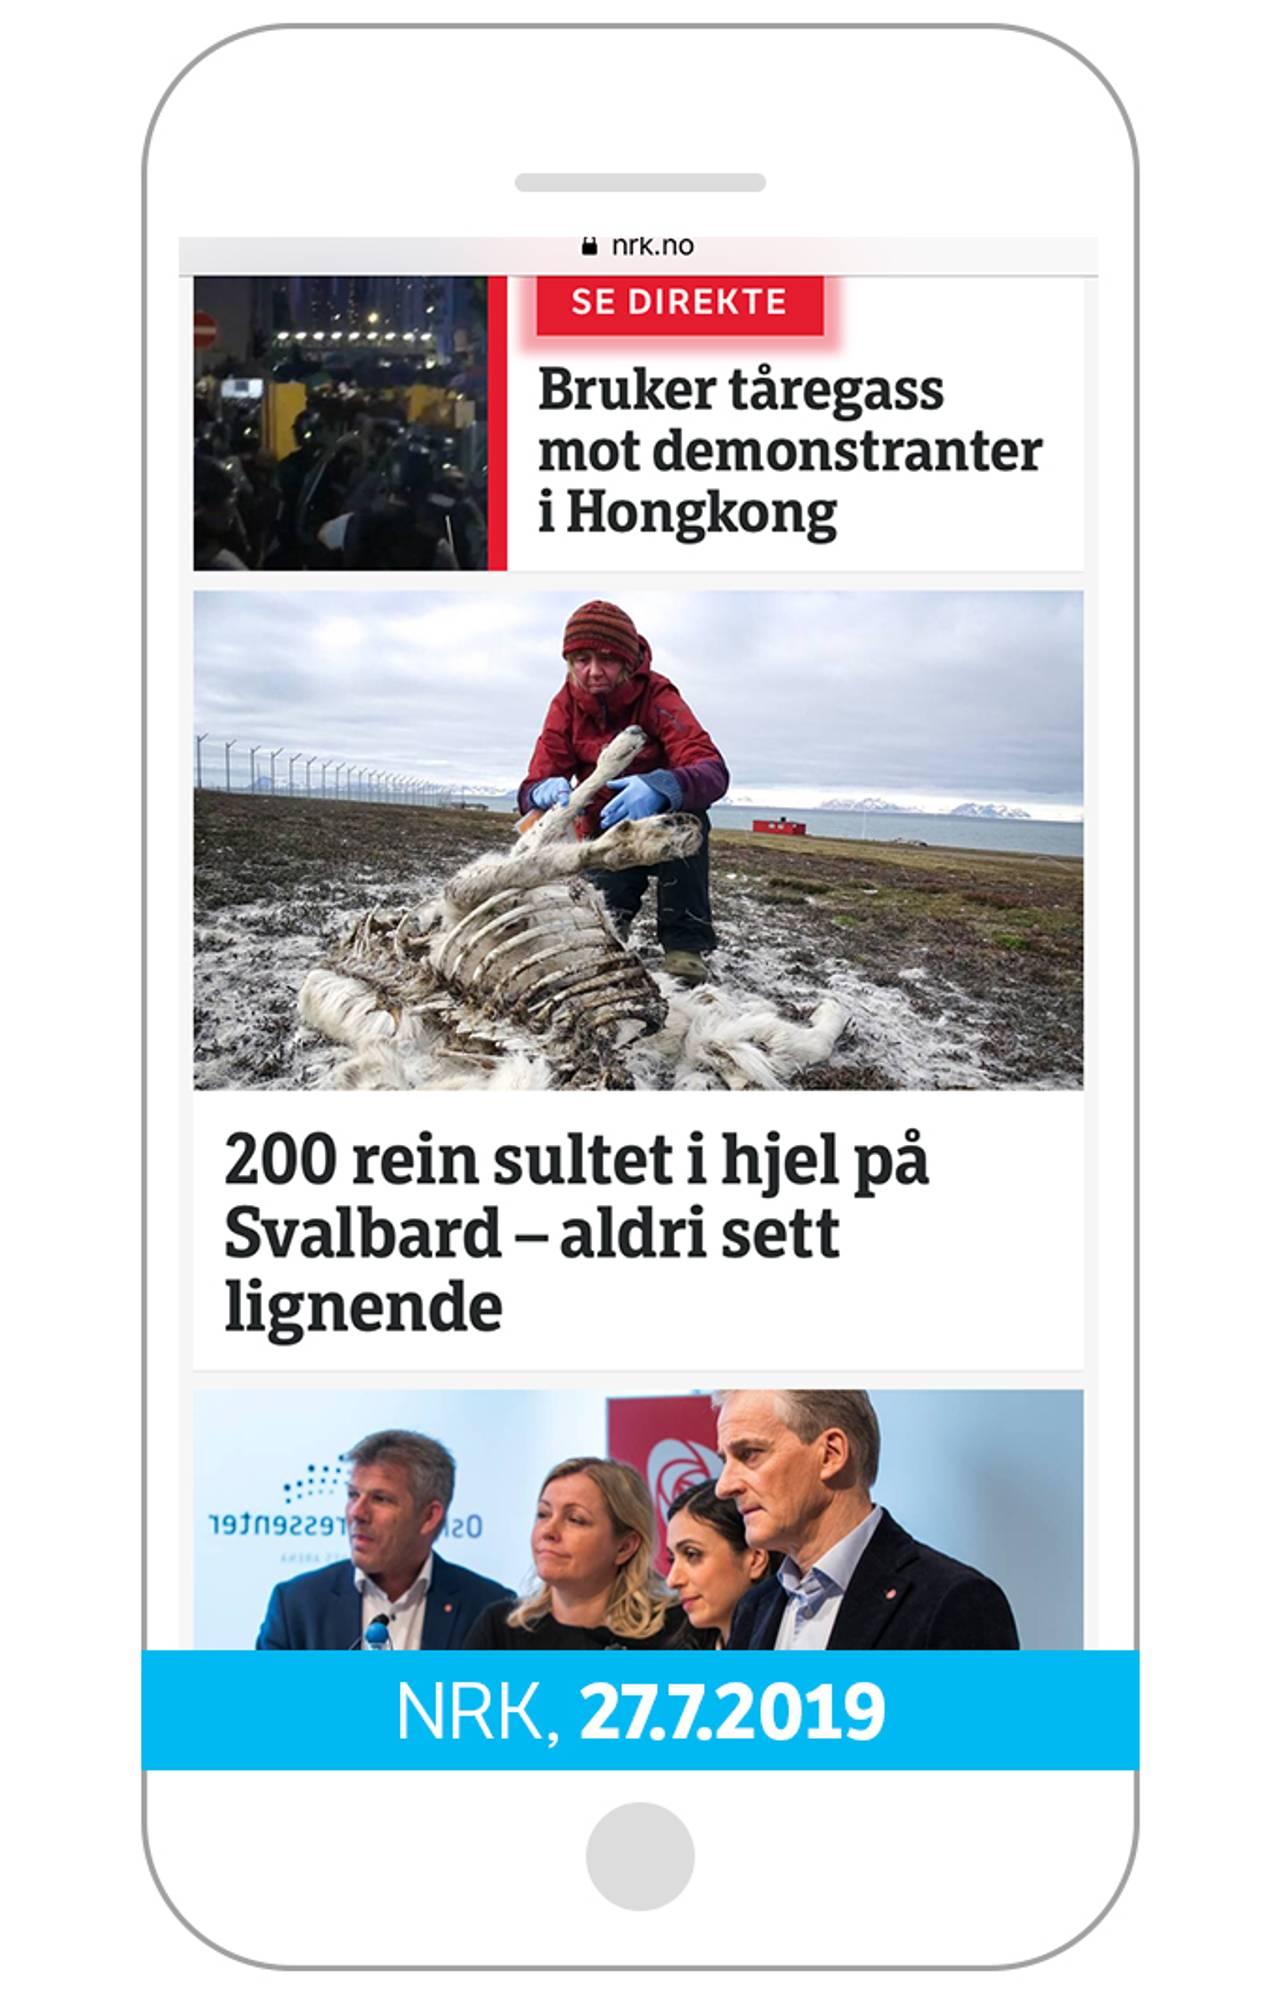 200 rein sultet i hjel på Svalbard